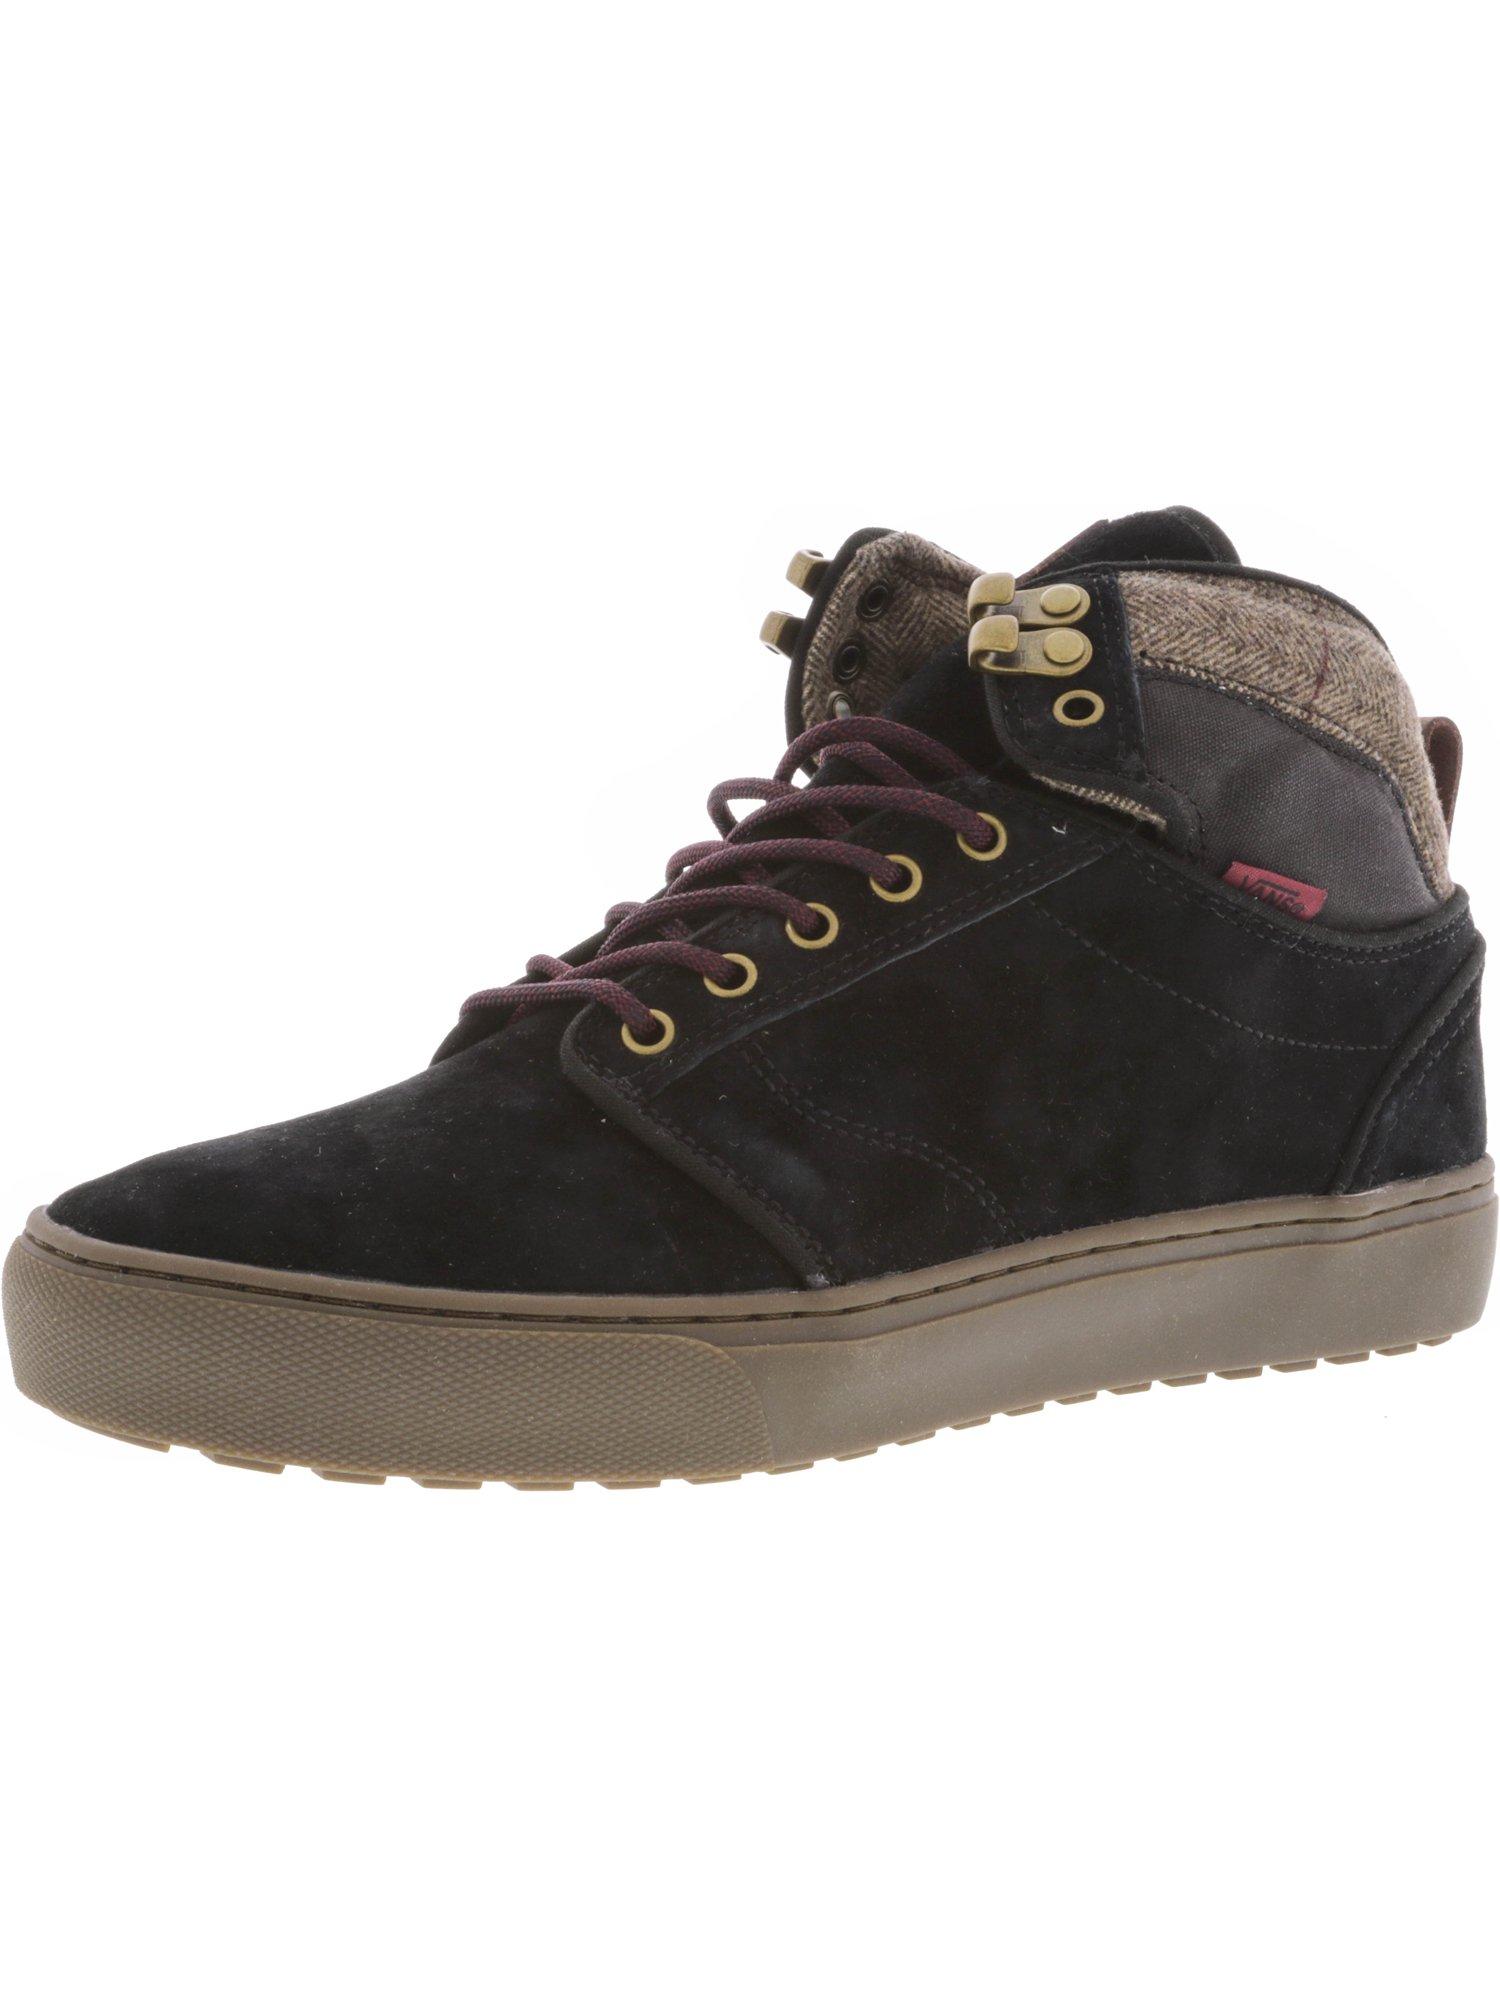 Vans-Alomar-Trek-MTE-Tobillo-Alto-Ante-skateboard-Zapato